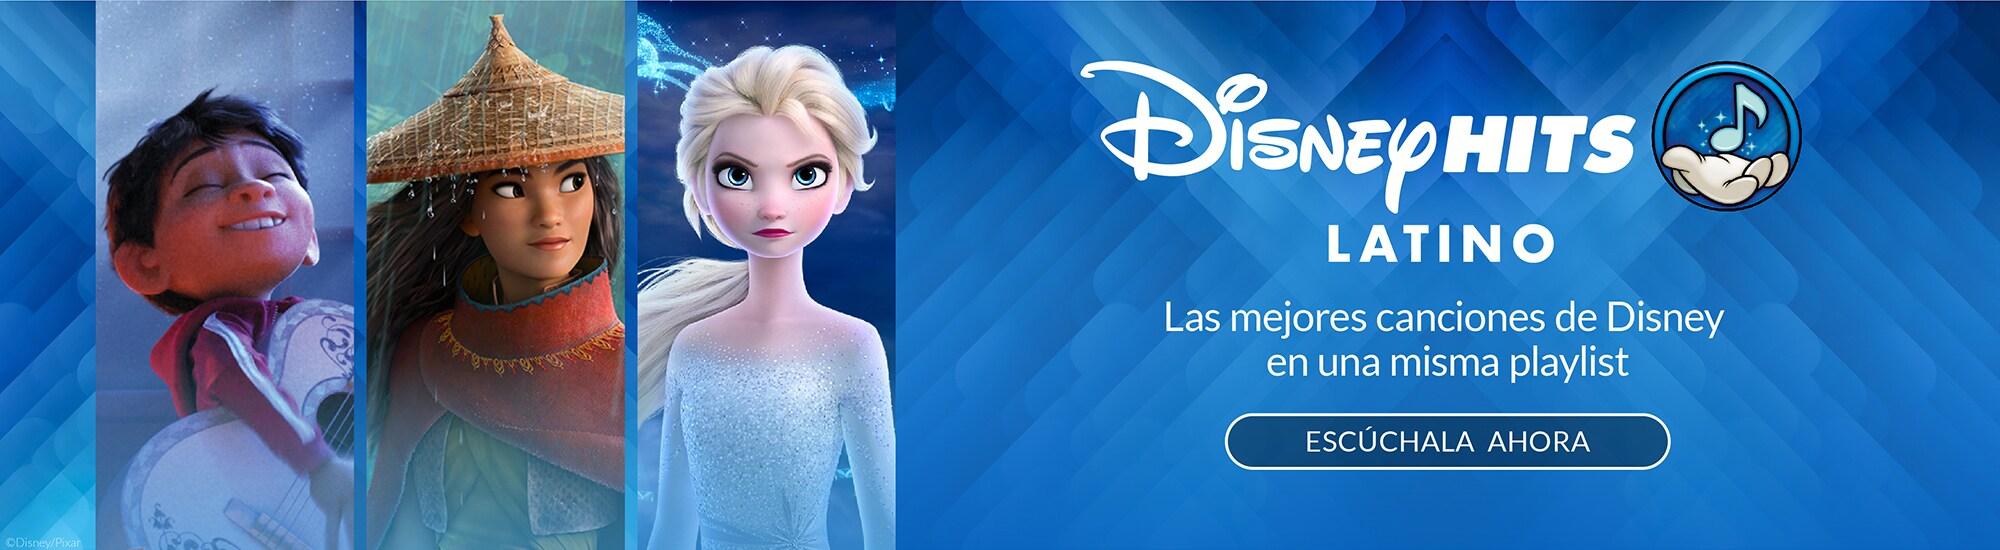 Top_Hub Music_Disney Hits